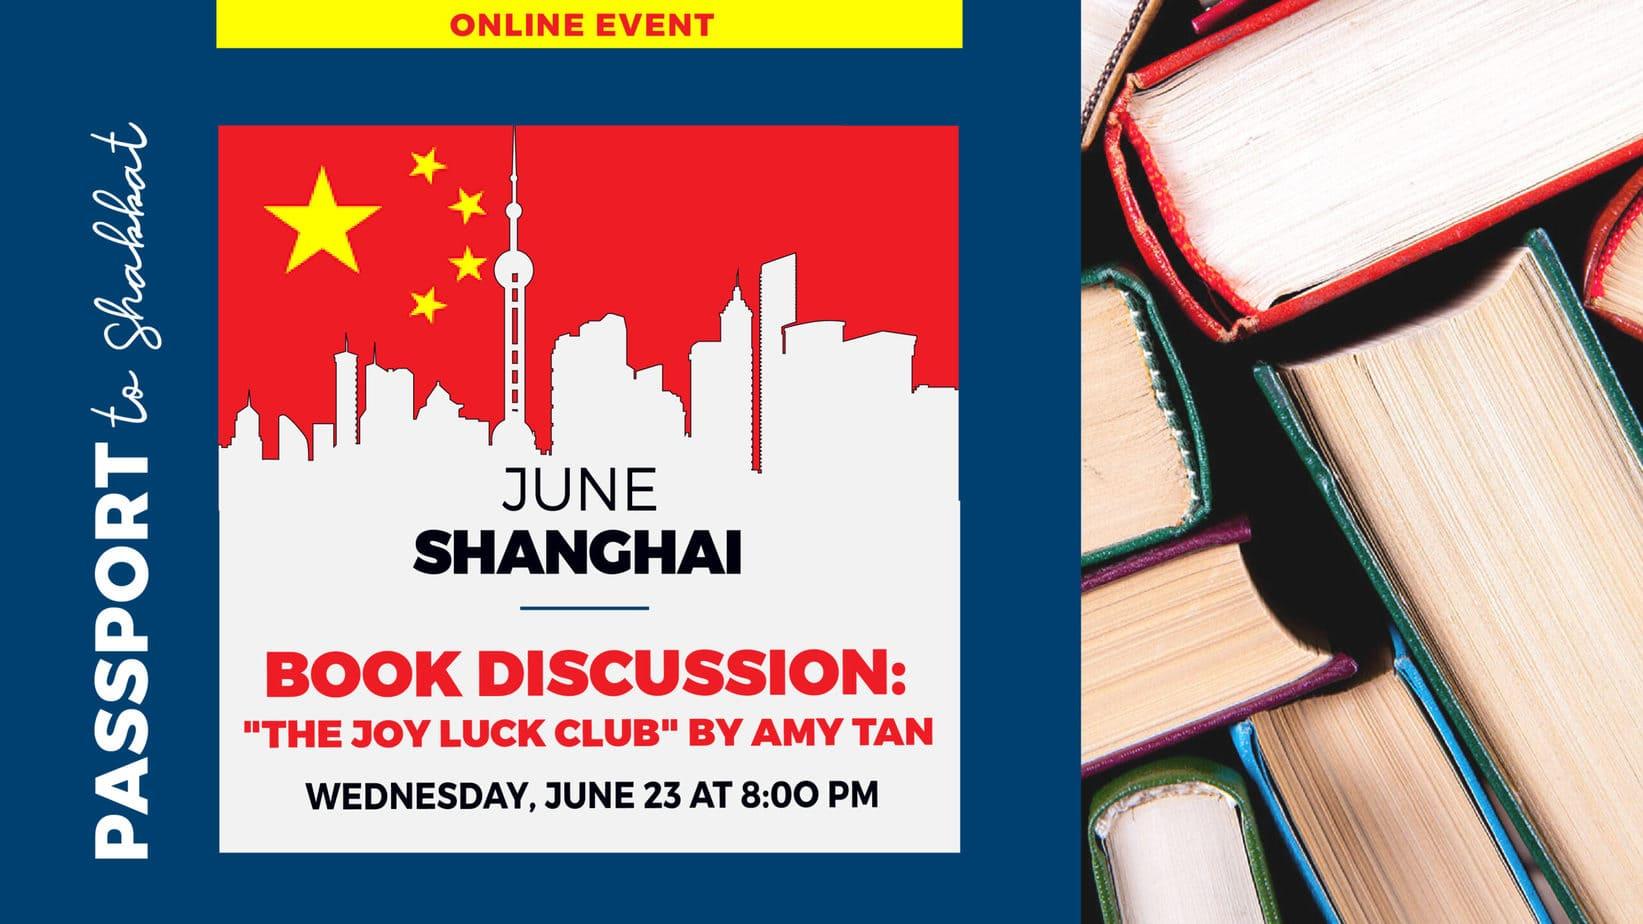 Social Media June 23 -online event